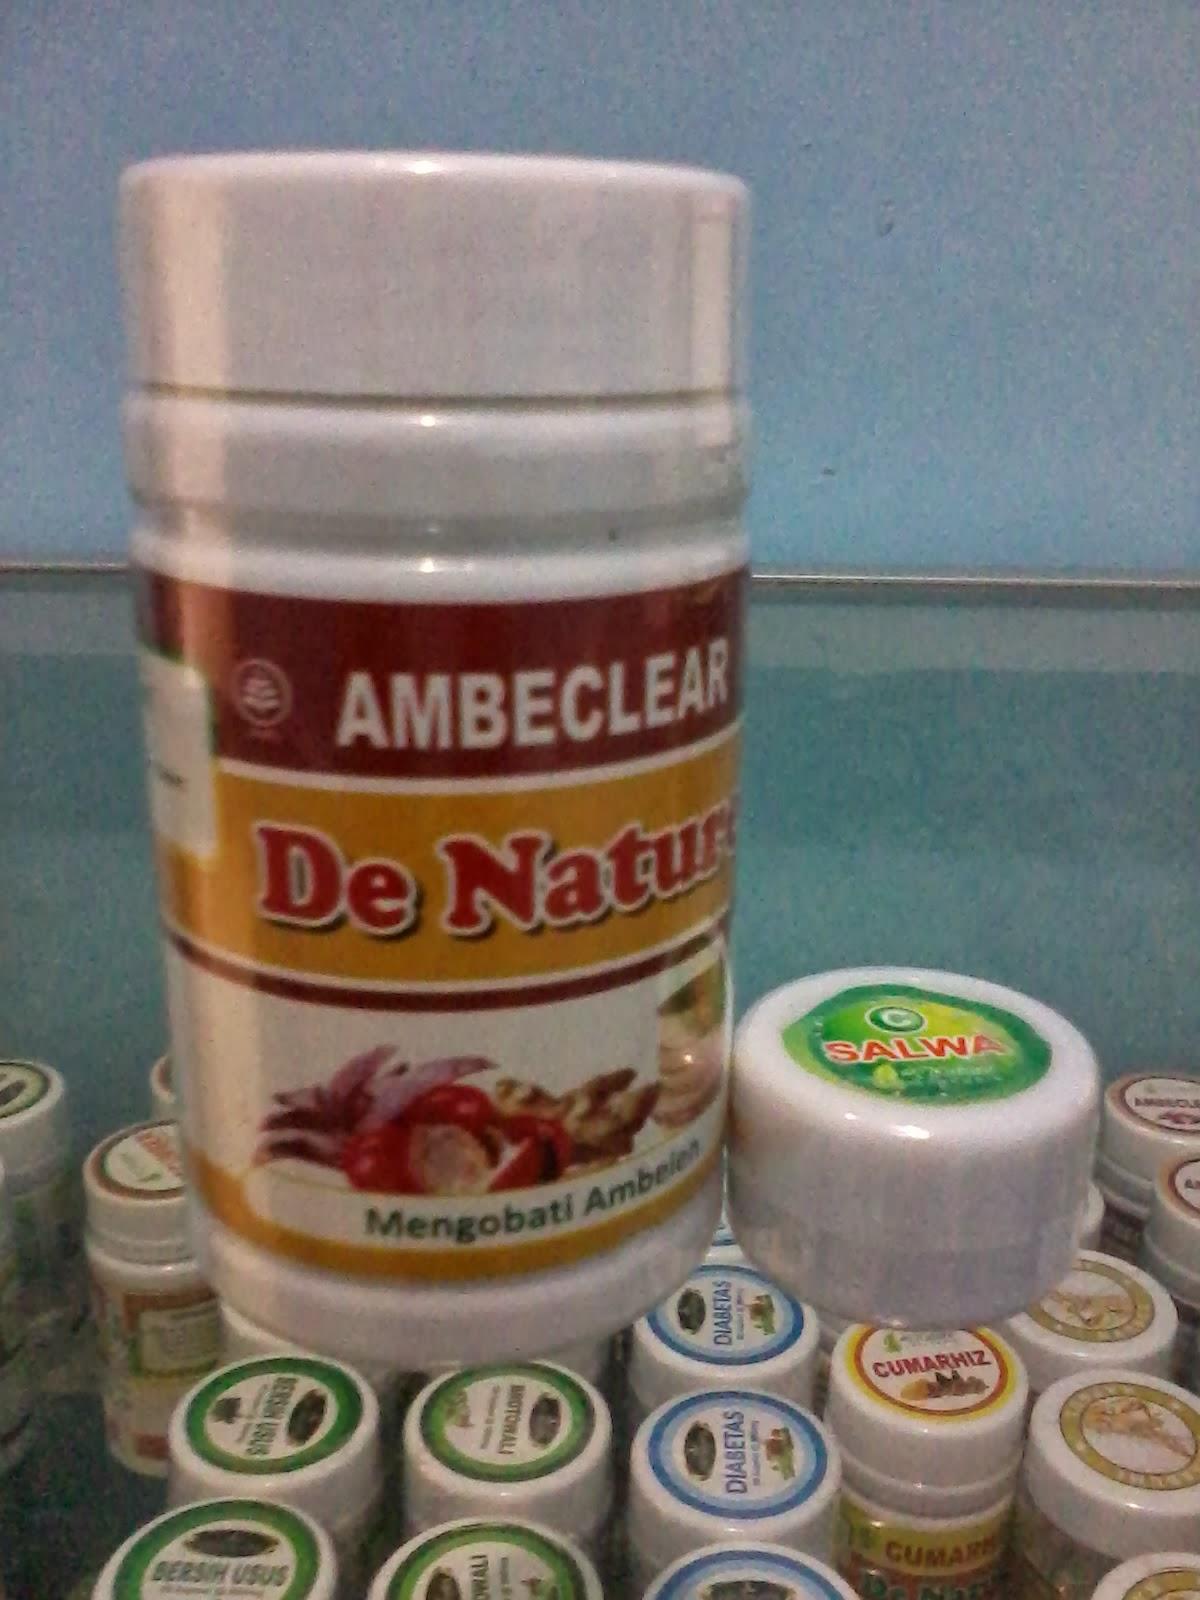 obat wasir yang sudah parah bab berdarah apotik herbal obat alami penyakit kutil kelamin